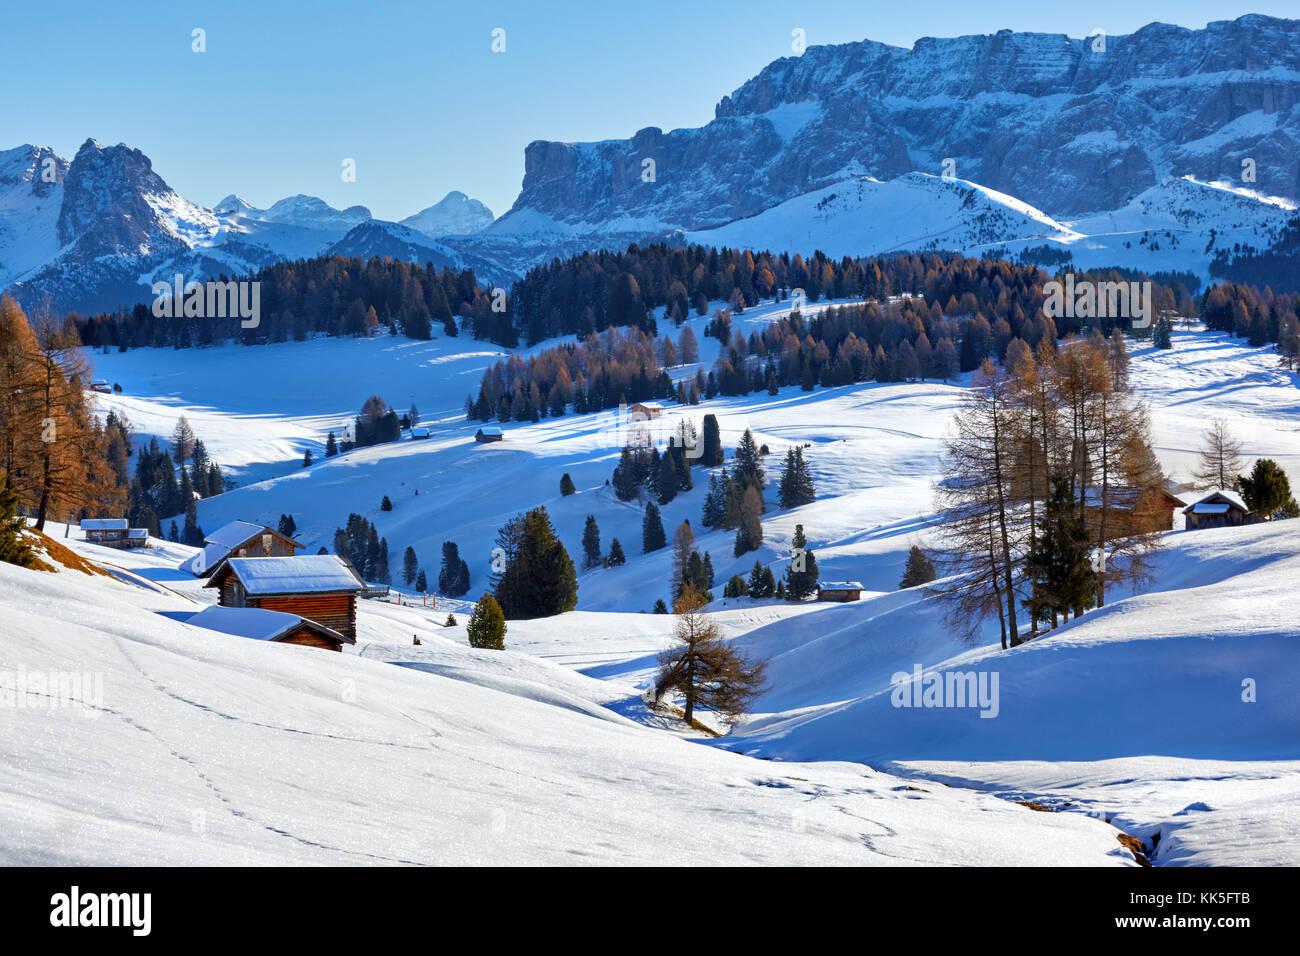 Lever de soleil sur l'hiver Alpe di Siusi Dolomites, Italie Photo Stock